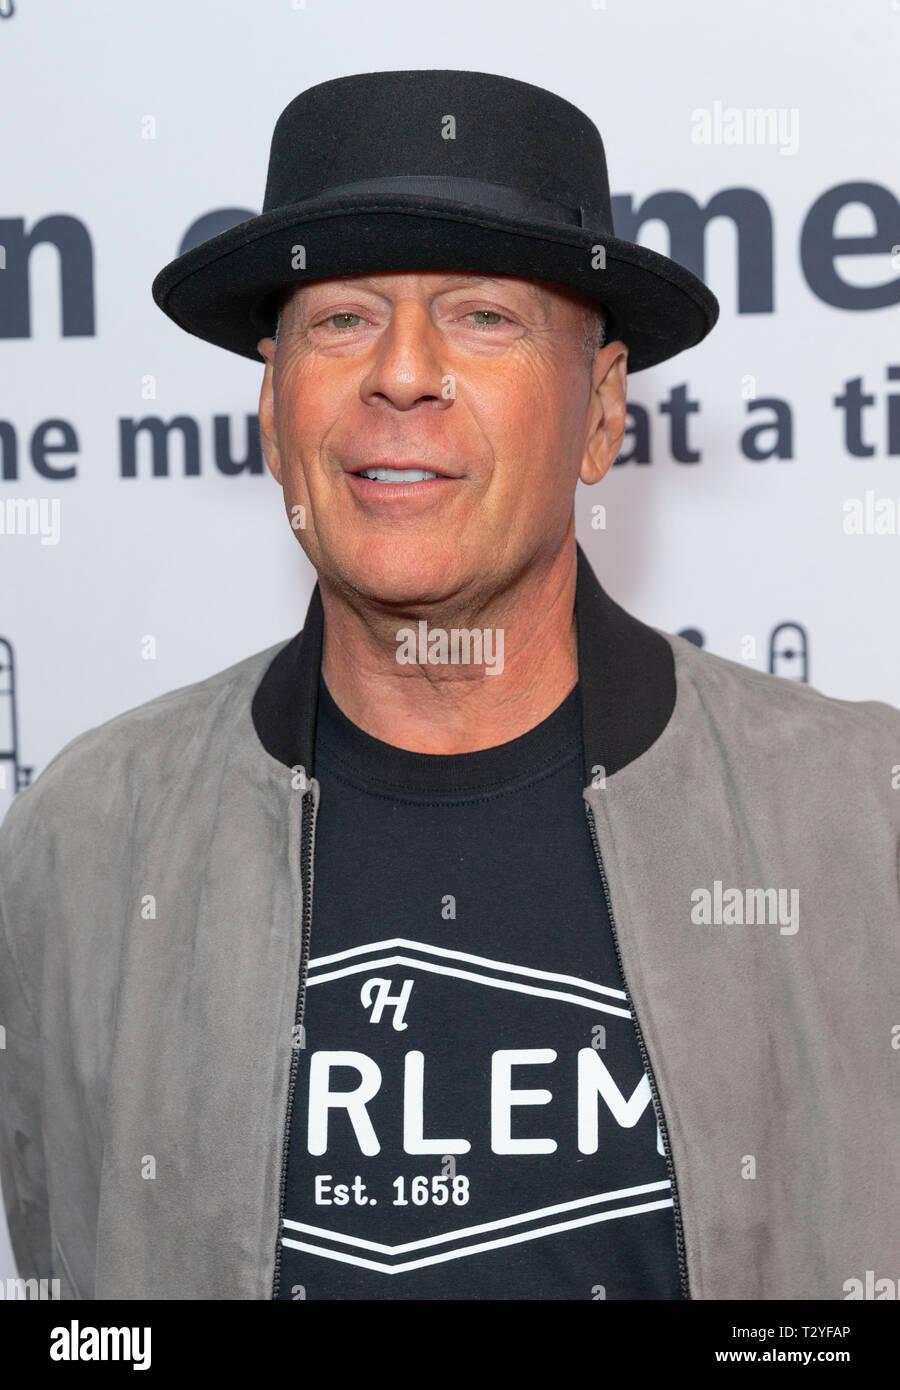 New York, NY - April 4, 2019: Bruce Willis attends Jazz